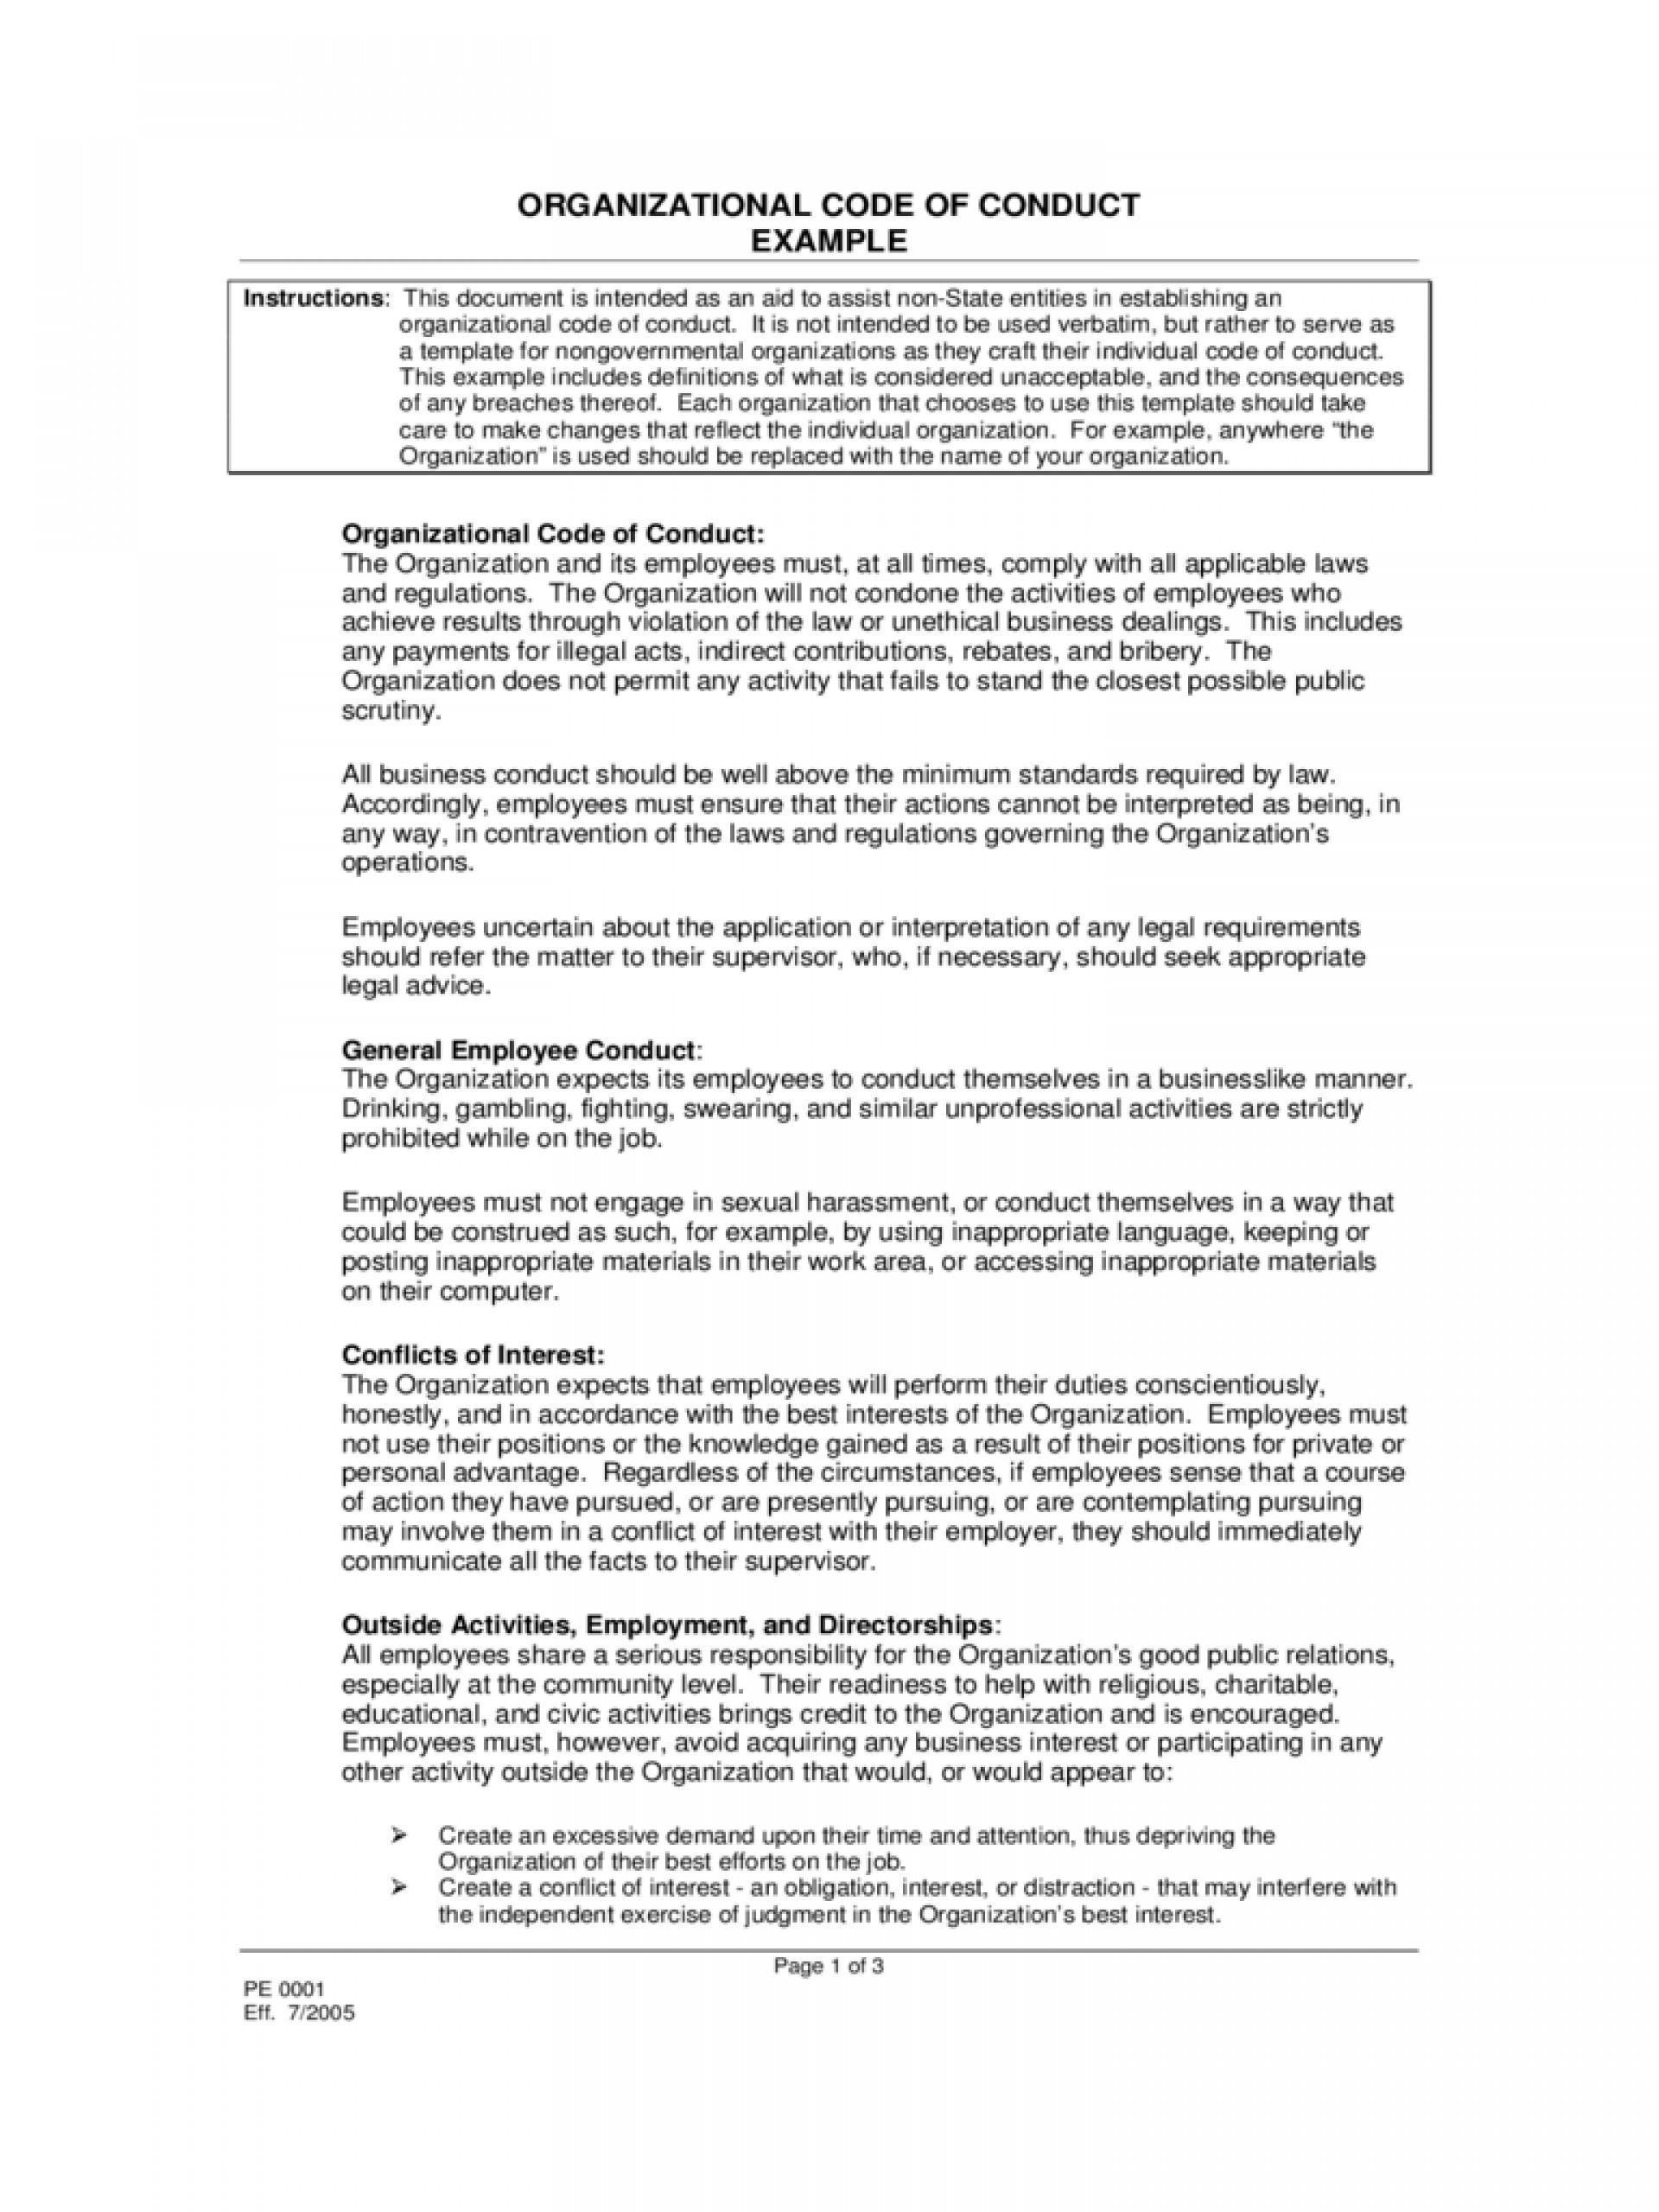 Employee Code Of Conduct Sample Pdf